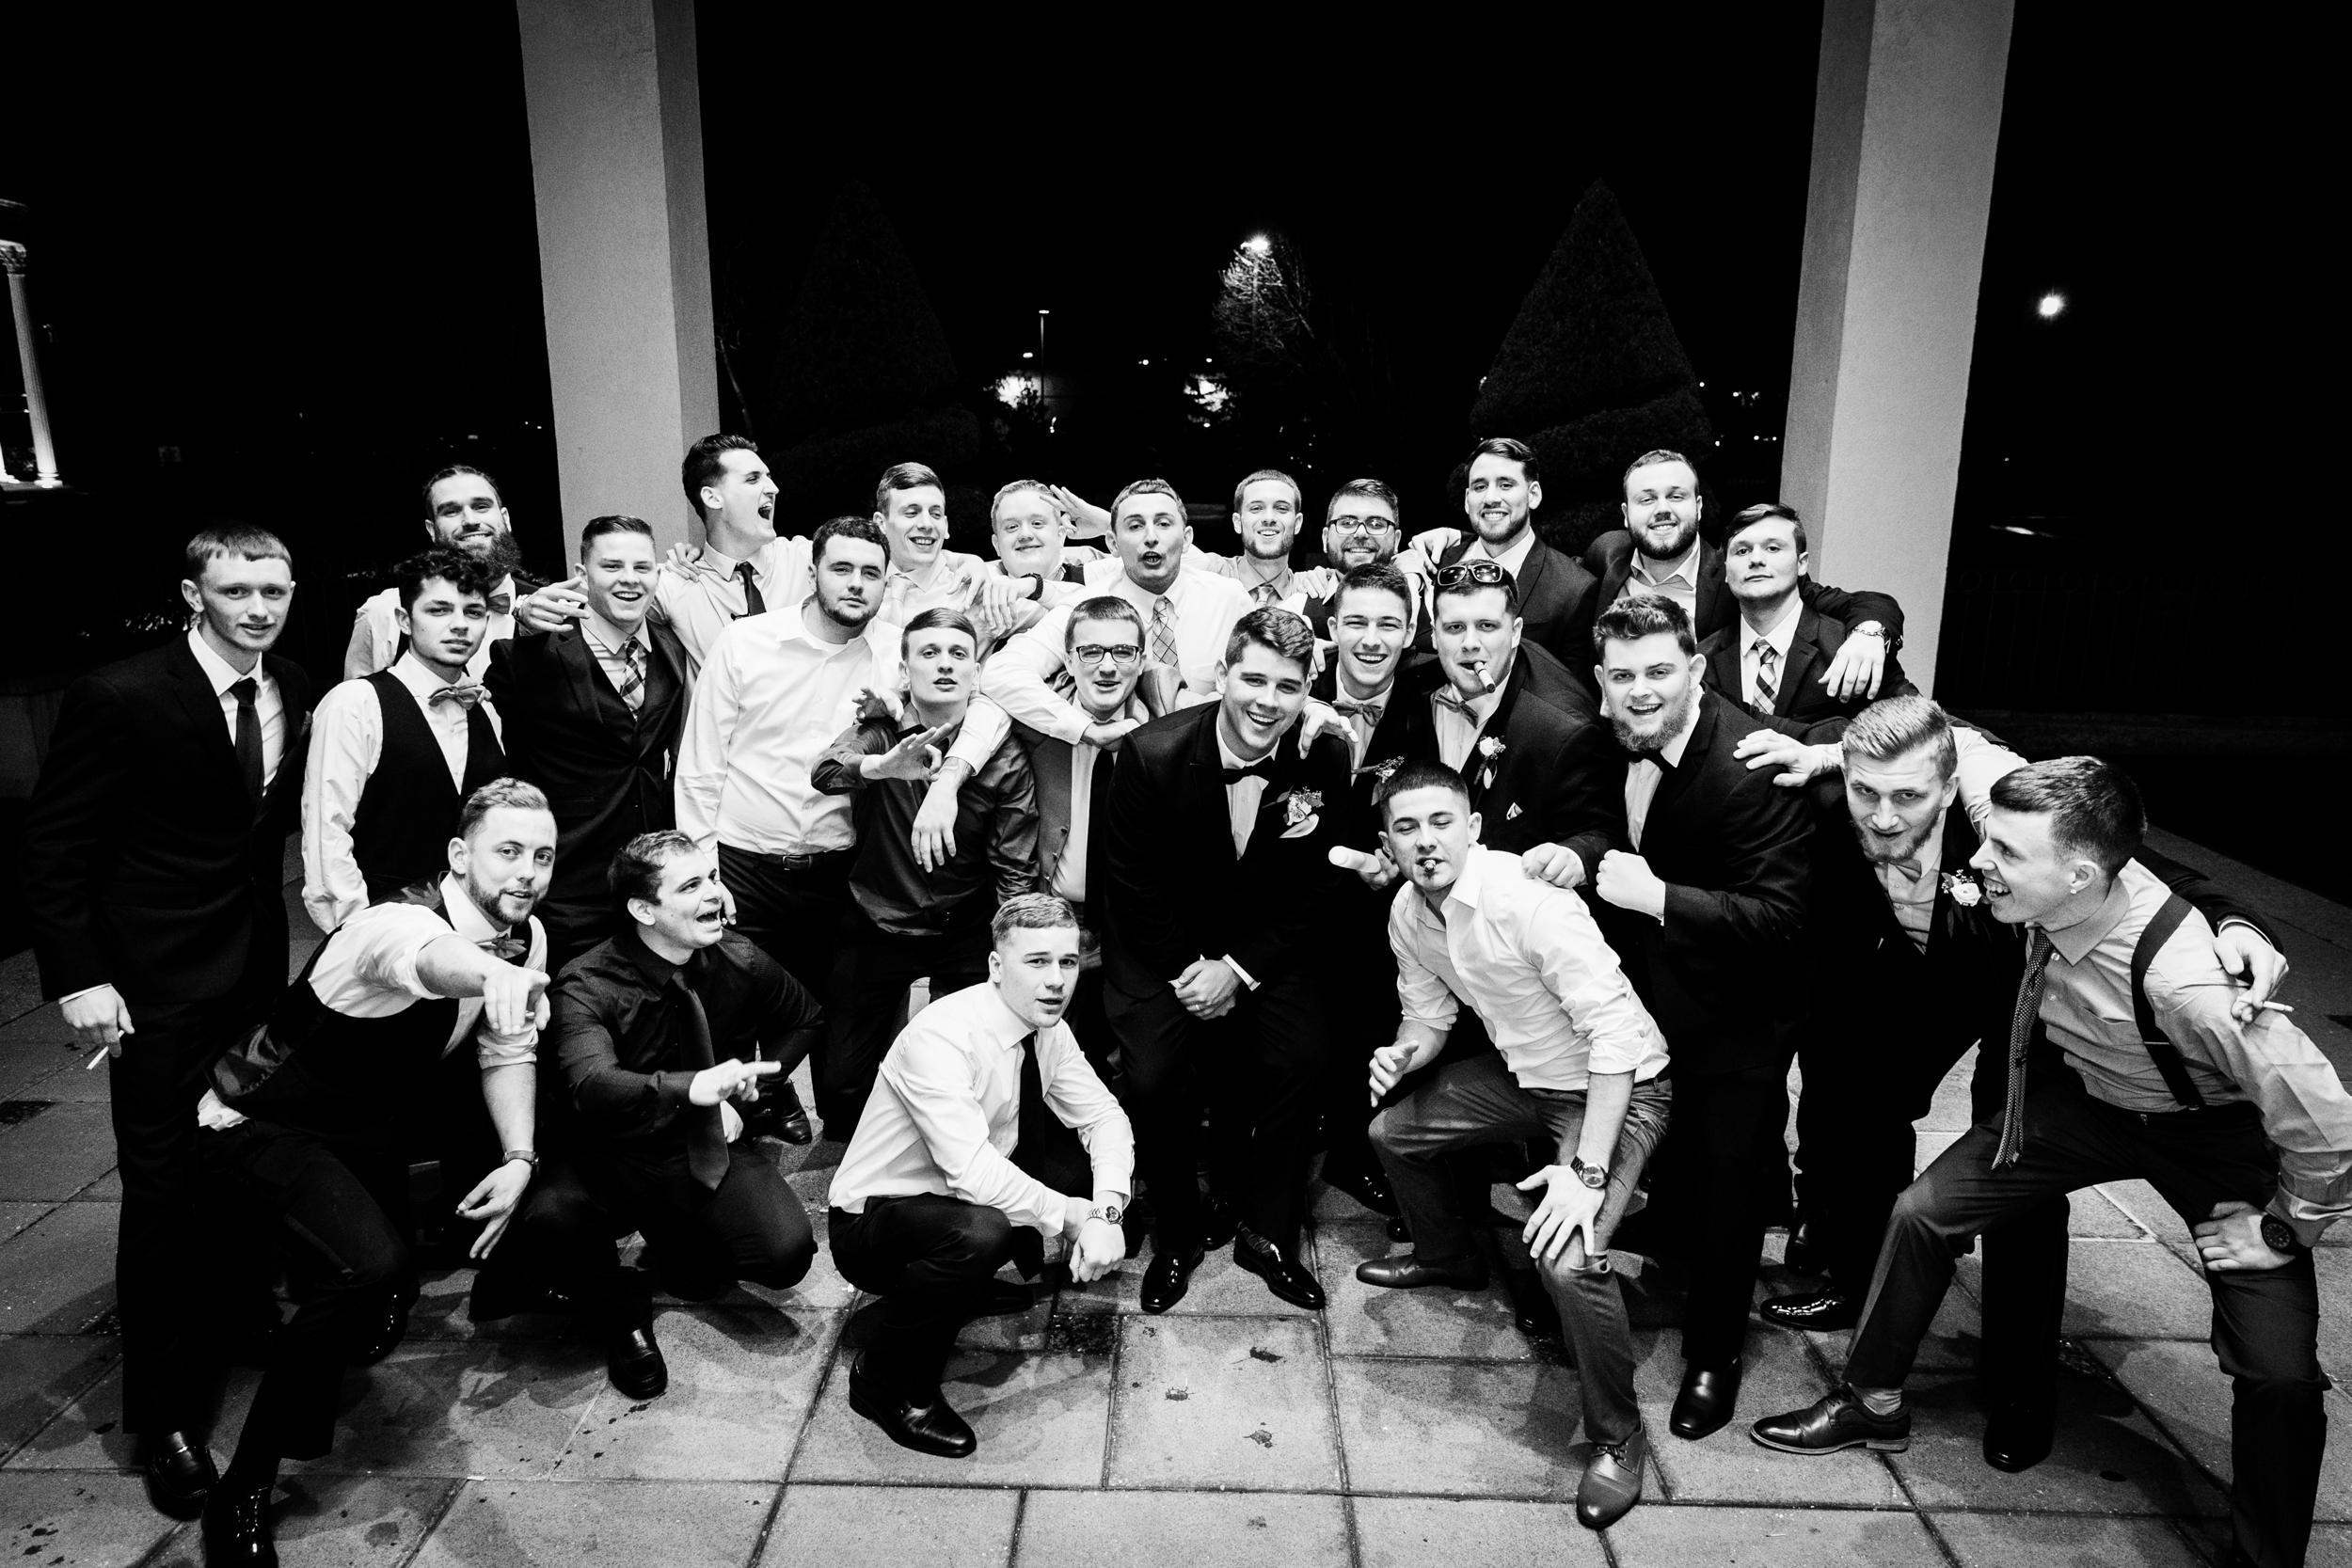 CELEBRATIONS BENSALEM WEDDING PHOTOGRAPHY-104.jpg